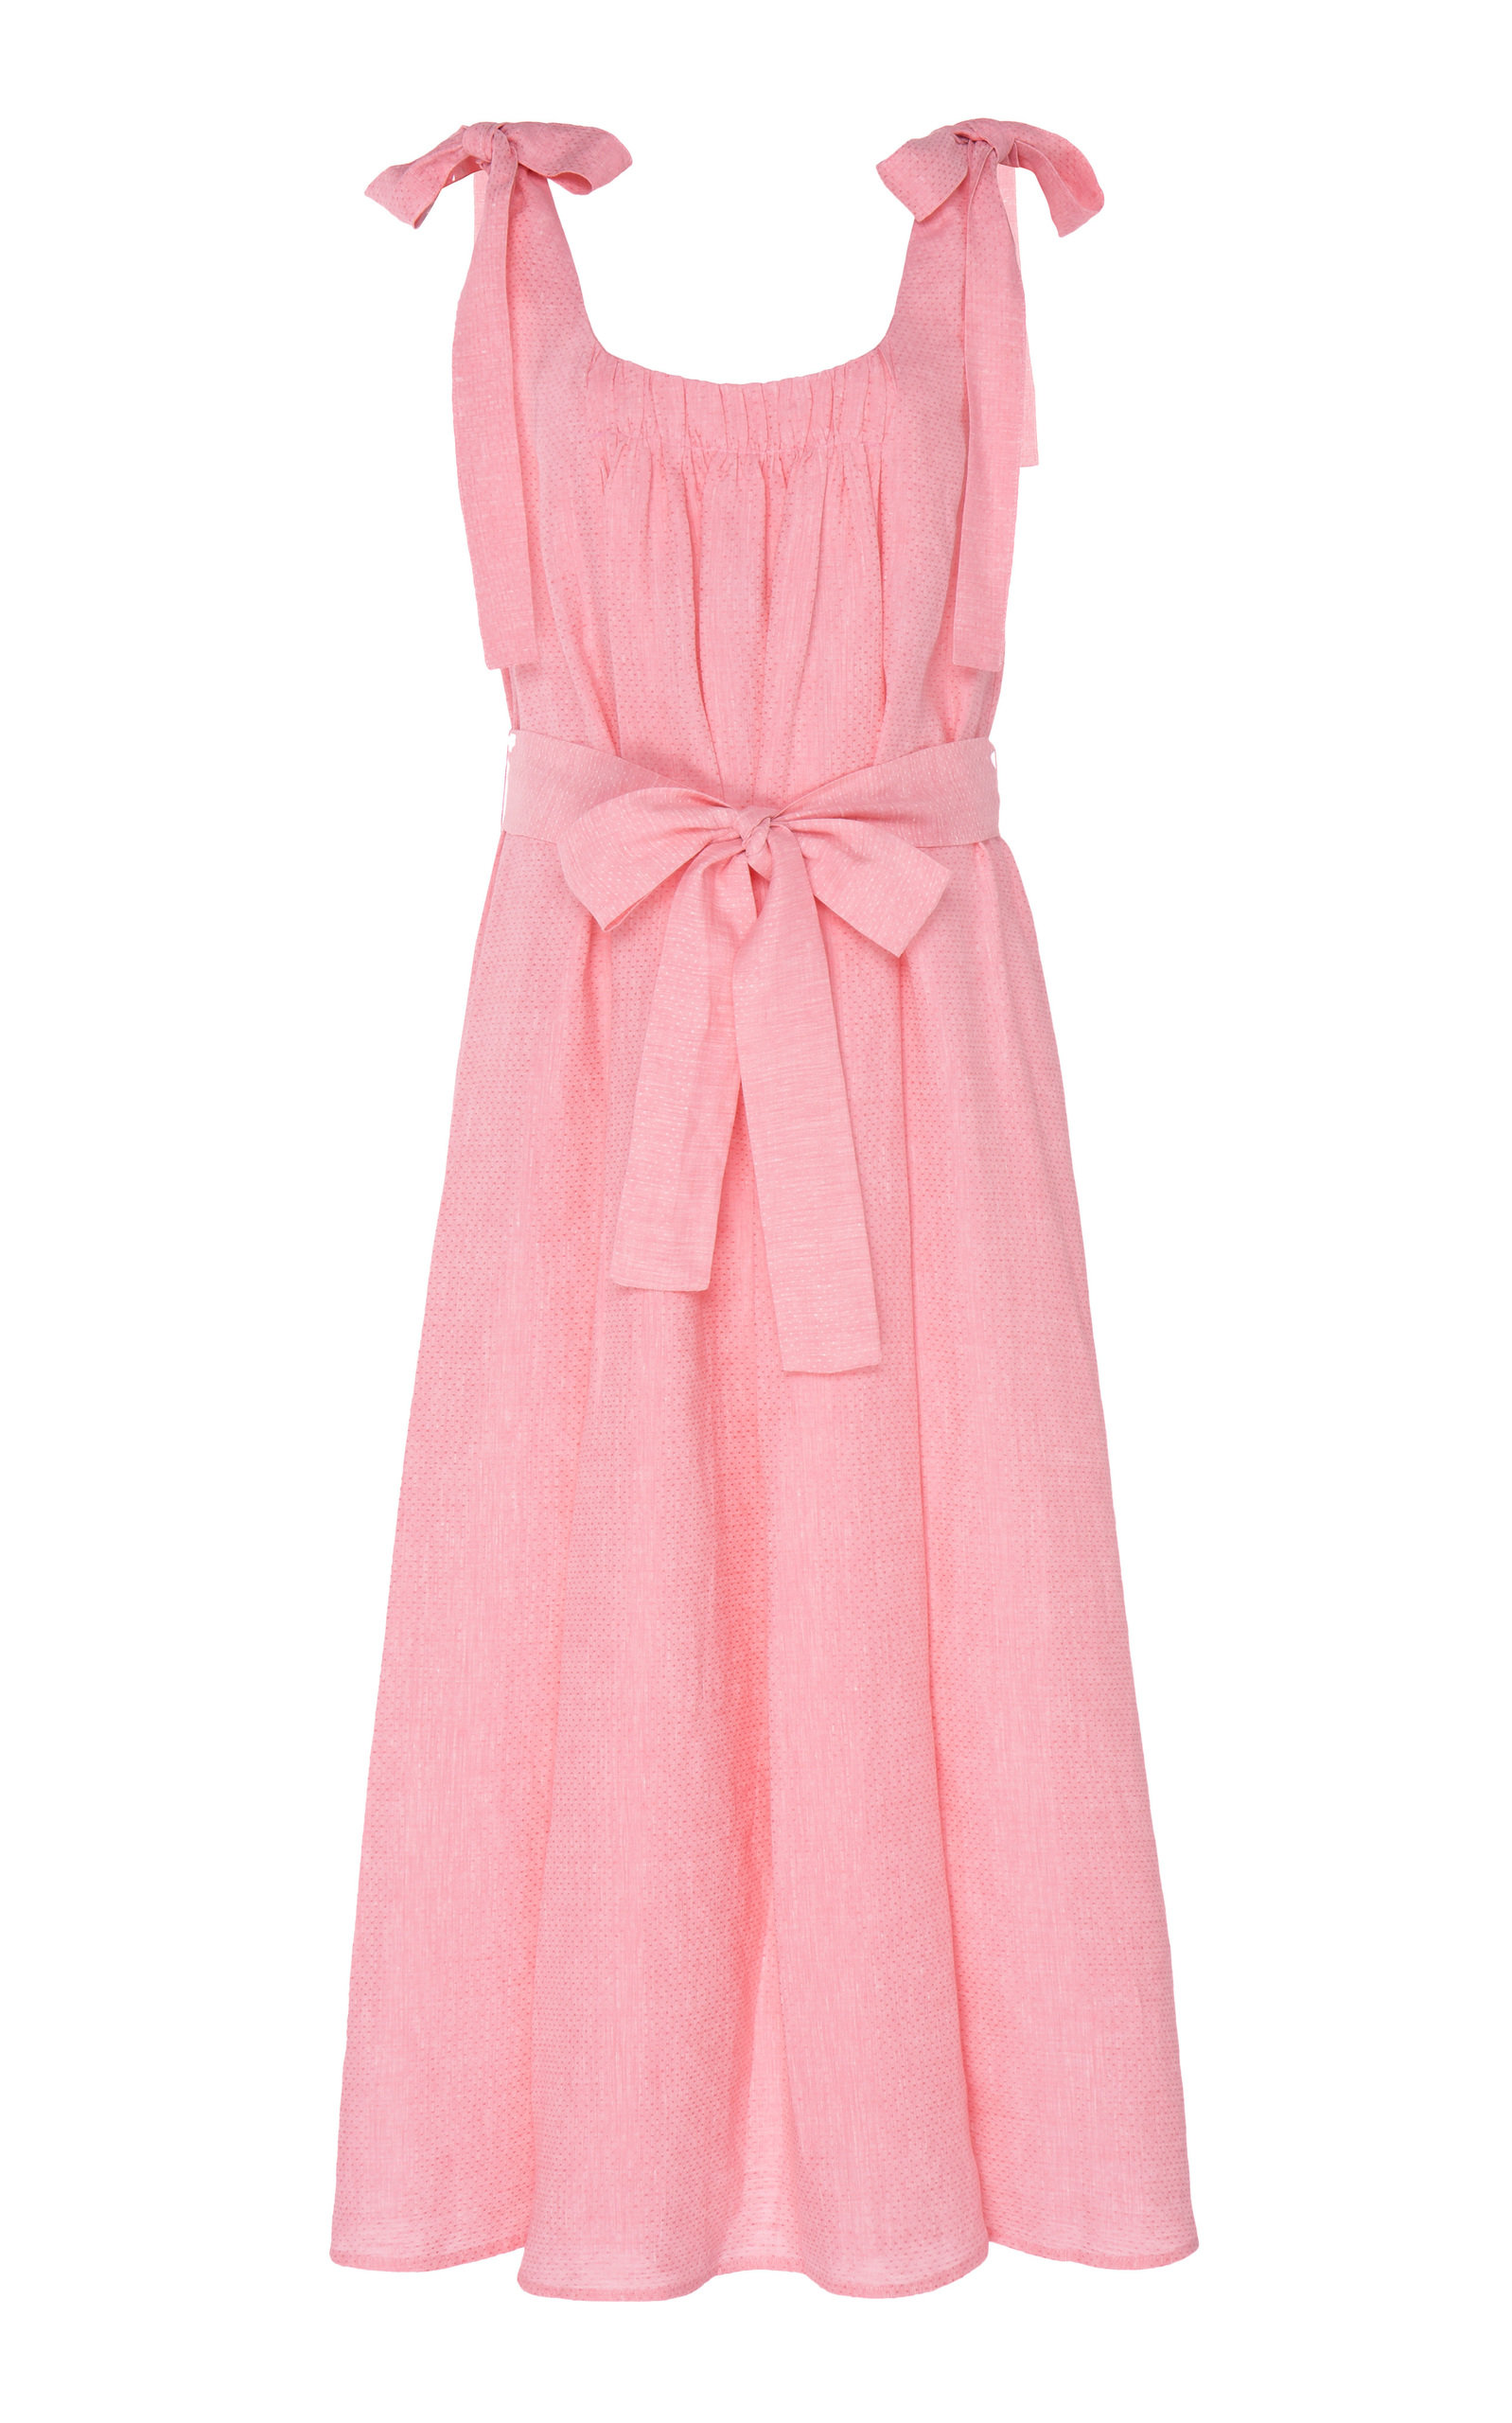 Buy Gül Hürgel Tie-Detailed Linen Midi Dress online, shop Gül Hürgel at the best price